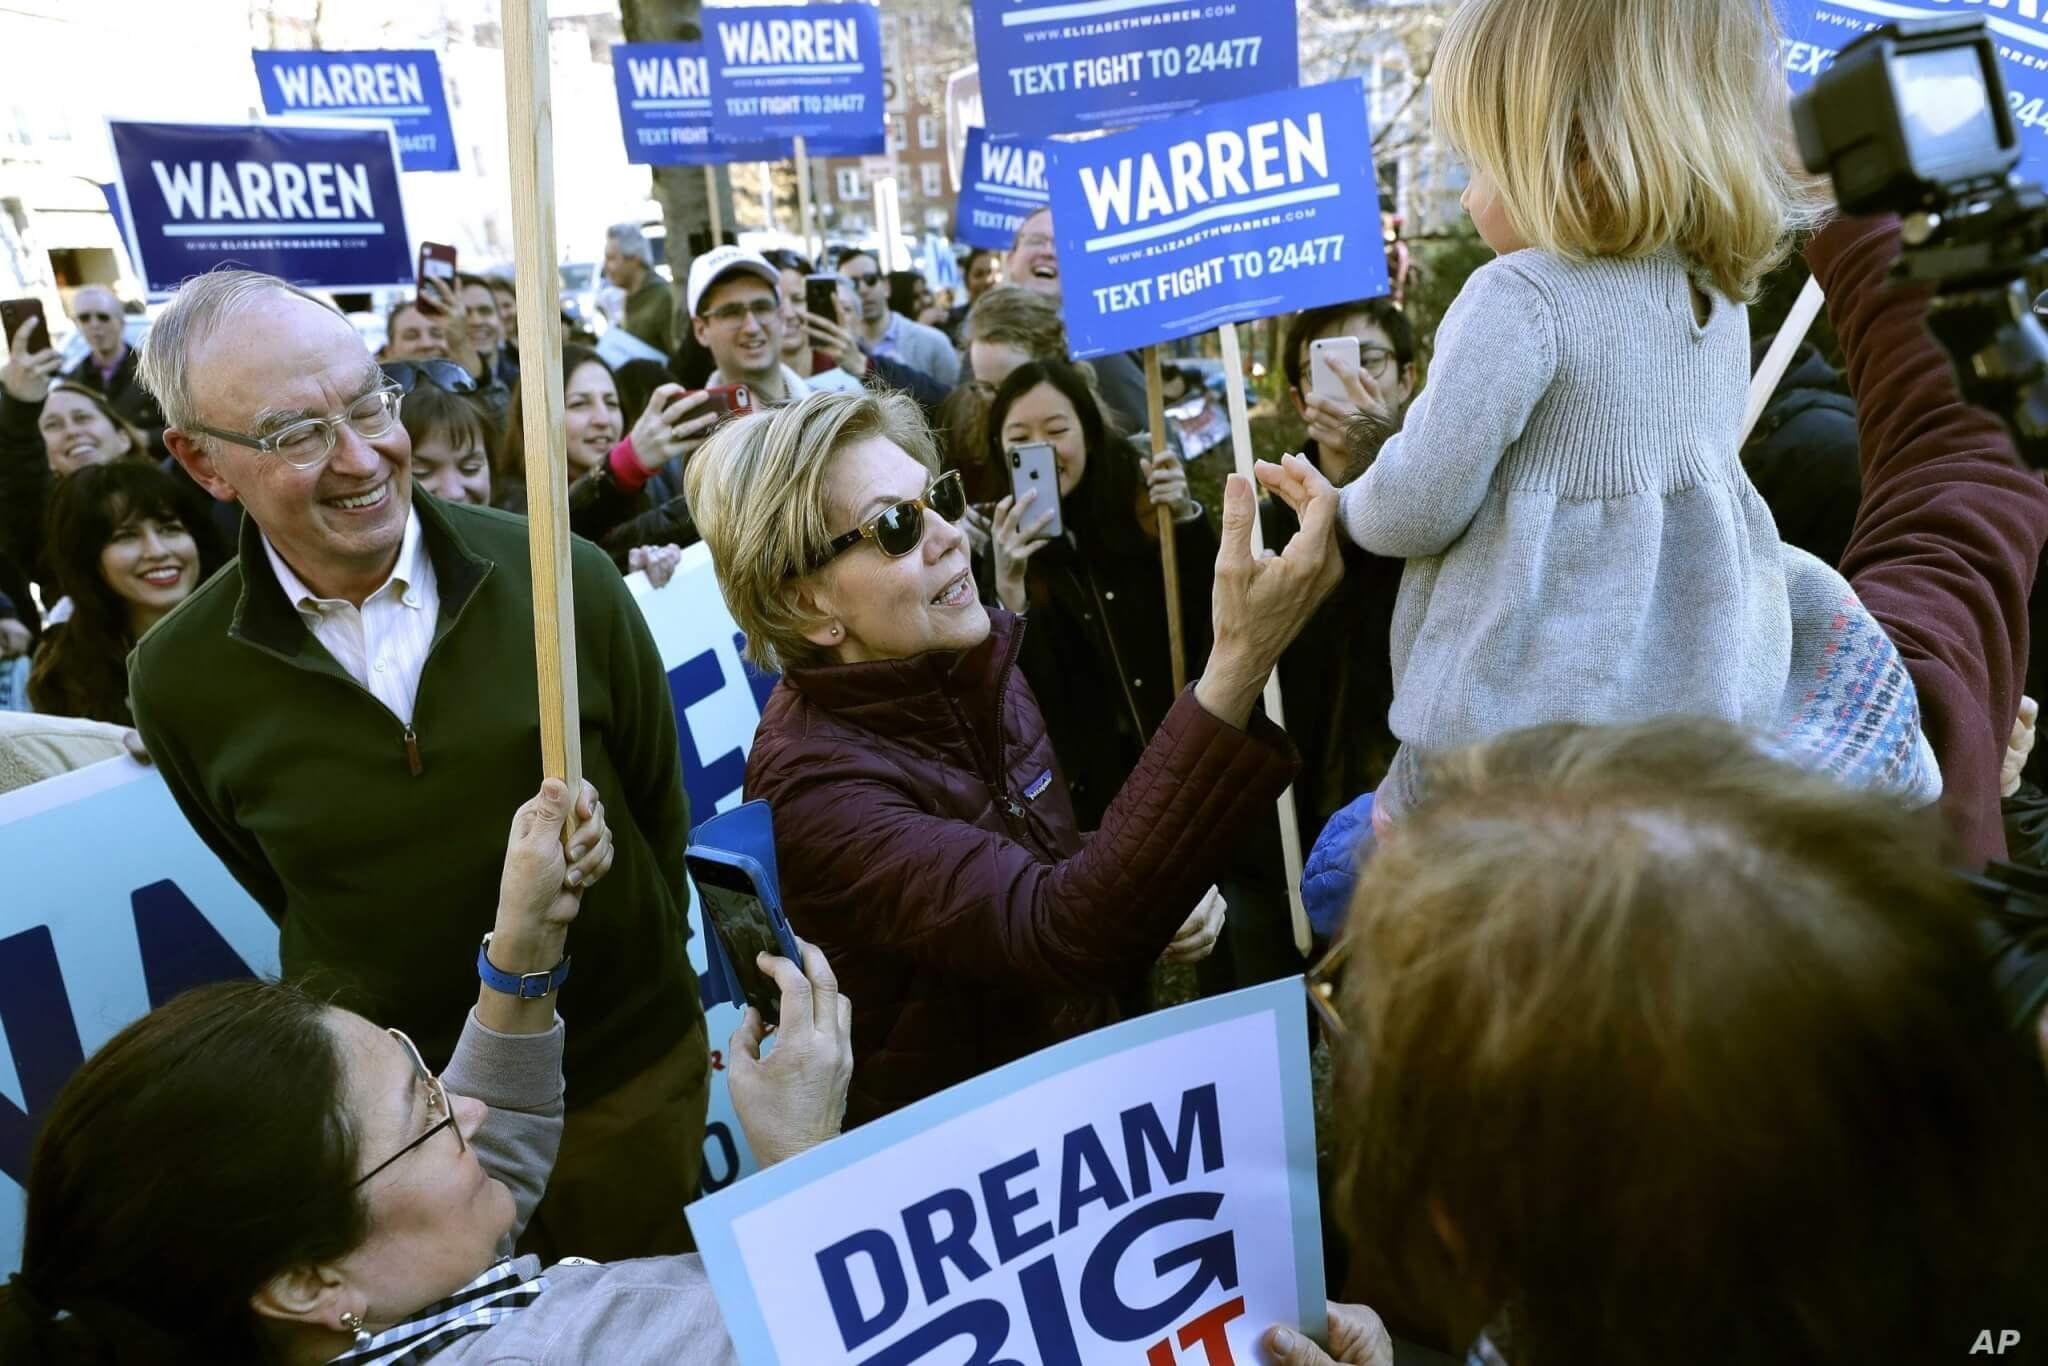 Democratic presidential candidate Sen. Elizabeth Warren, D-Mass., greets a young supporter